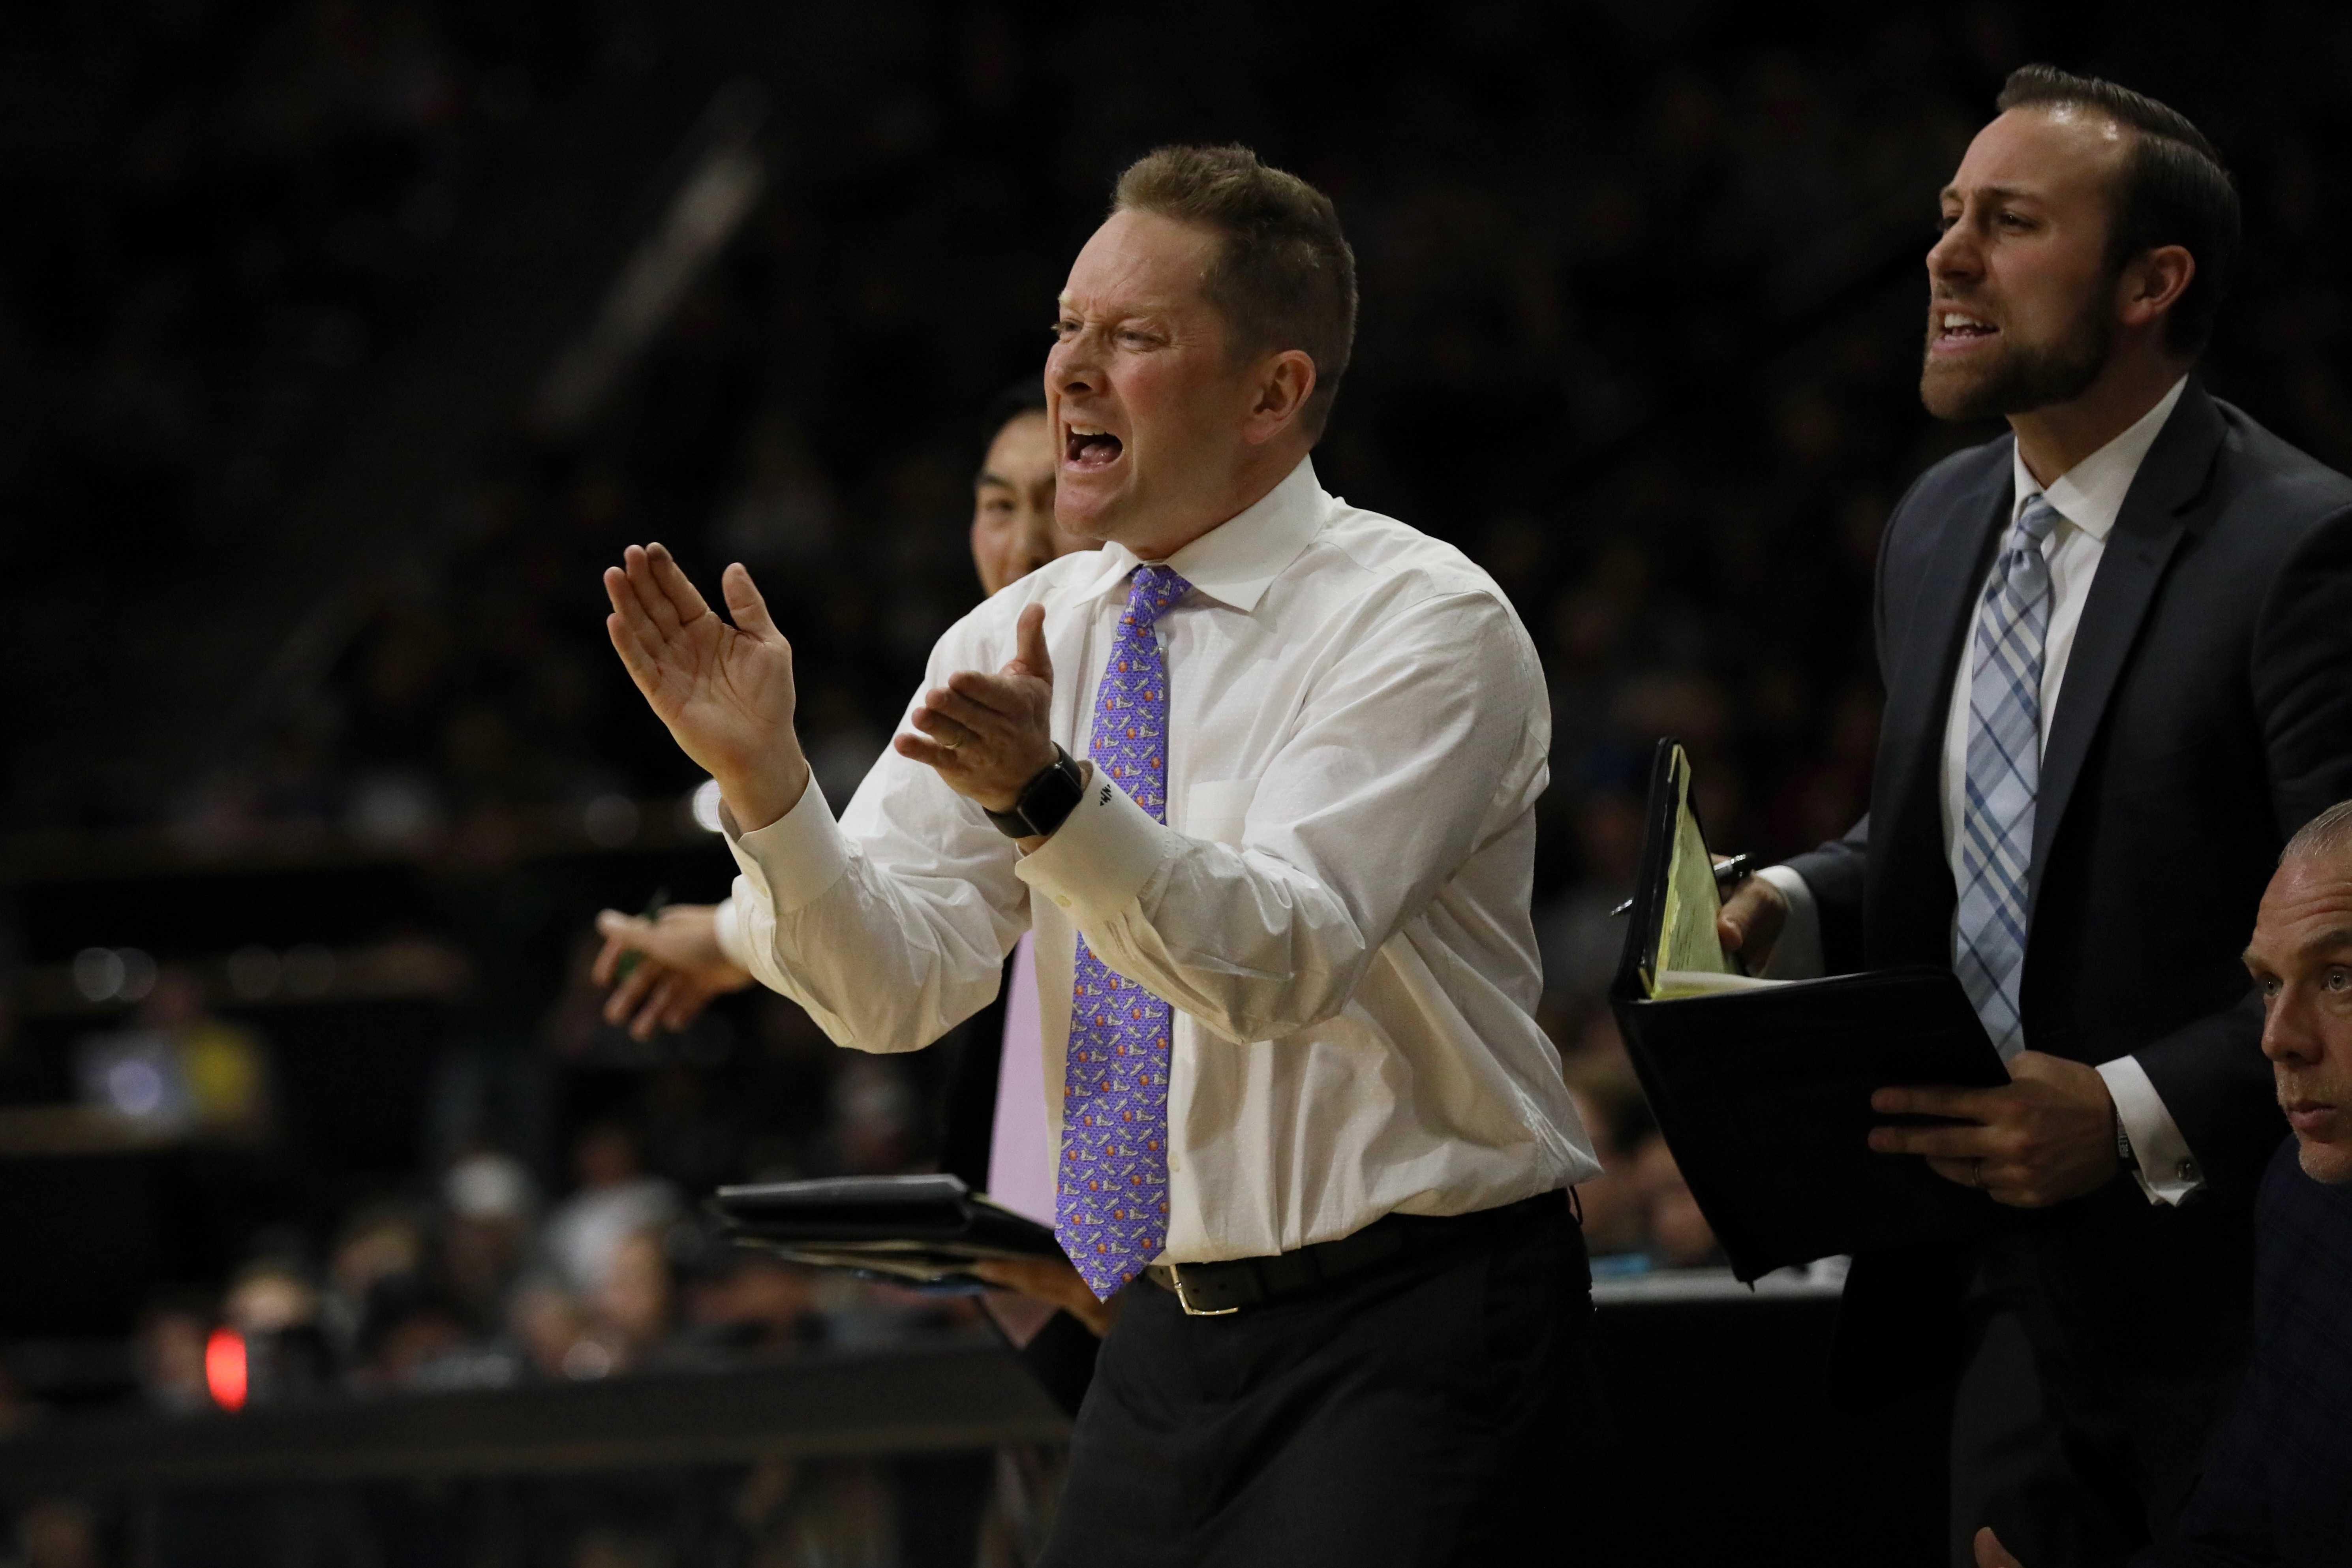 Colorado gets revenge on CSU as Buffs best Rams, 86-80